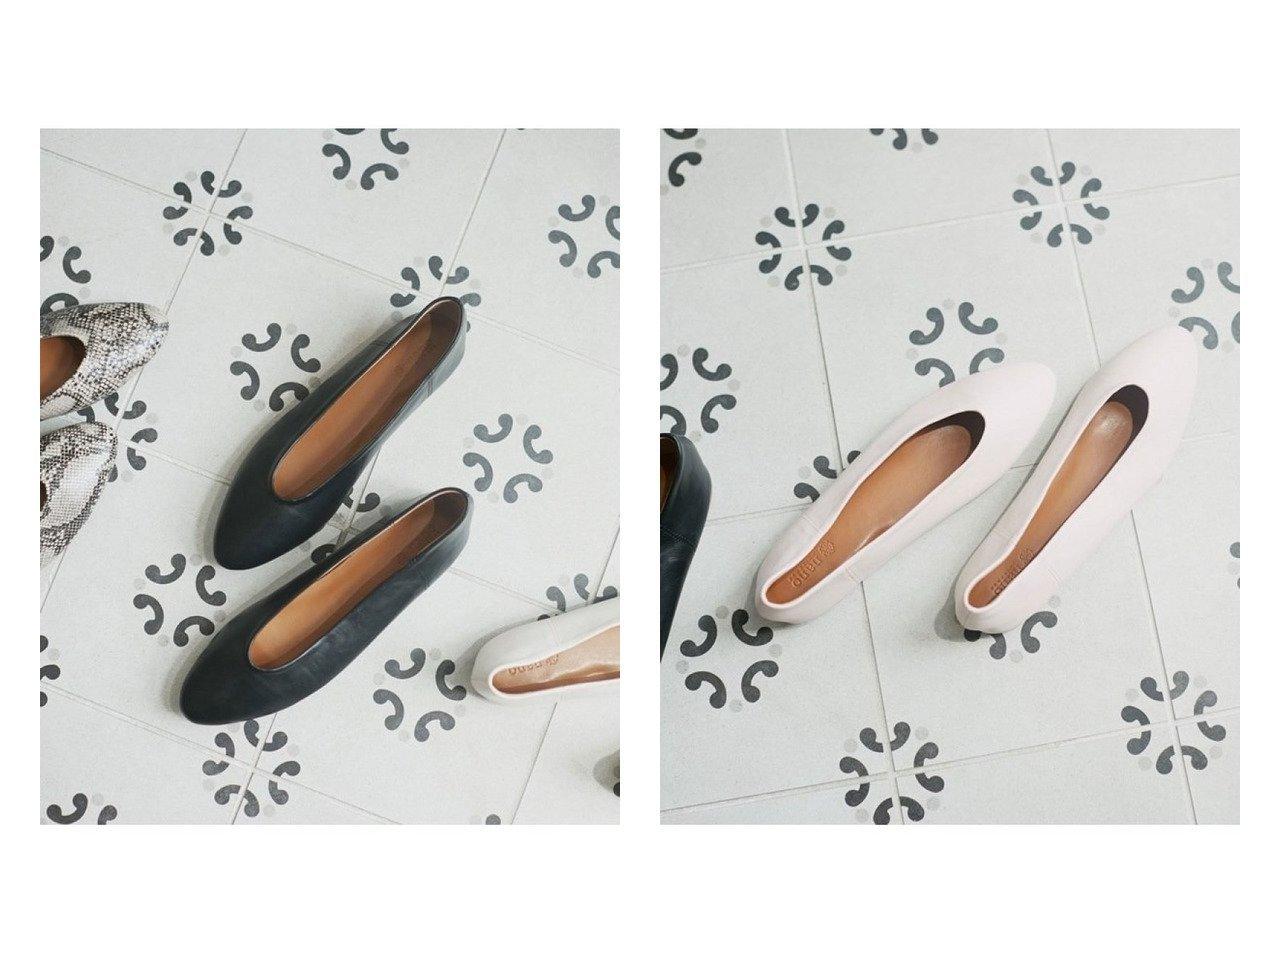 【nano universe/ナノ ユニバース】のフェイクレザーフラットシューズ シューズ・靴のおすすめ!人気、トレンド・レディースファッションの通販 おすすめで人気の流行・トレンド、ファッションの通販商品 メンズファッション・キッズファッション・インテリア・家具・レディースファッション・服の通販 founy(ファニー) https://founy.com/ ファッション Fashion レディースファッション WOMEN シューズ シンプル パイソン フラット  ID:crp329100000012451